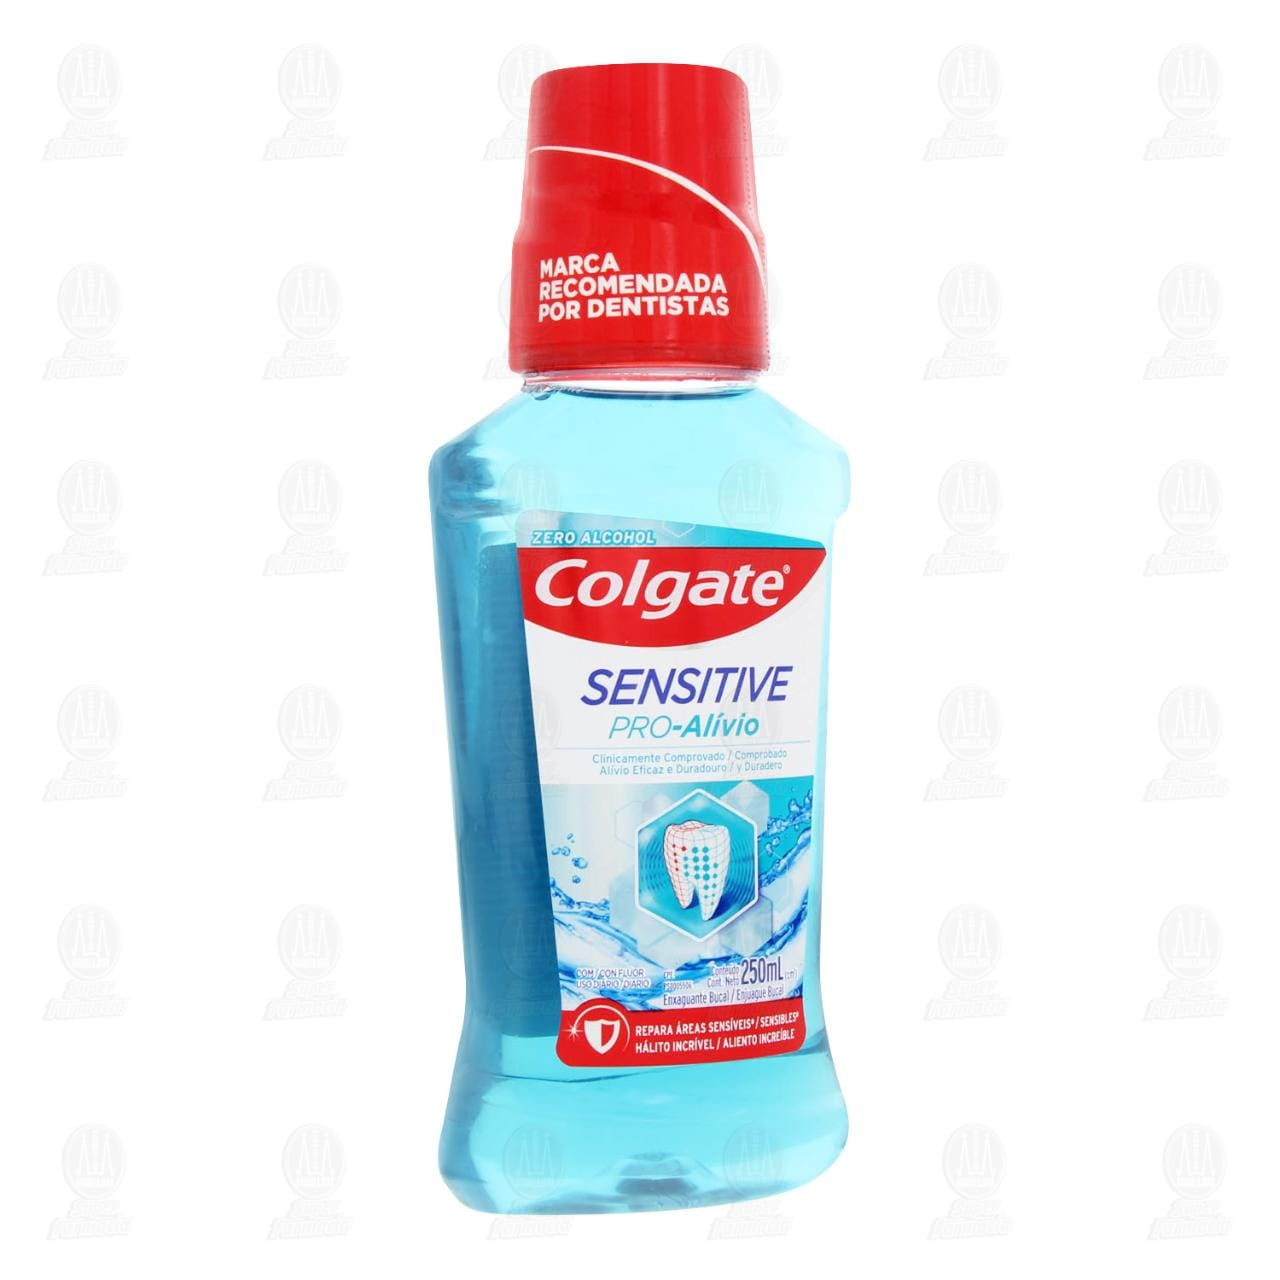 Comprar Enjuague Bucal Colgate Sensitive Pro-Alivio, 250 ml. en Farmacias Guadalajara